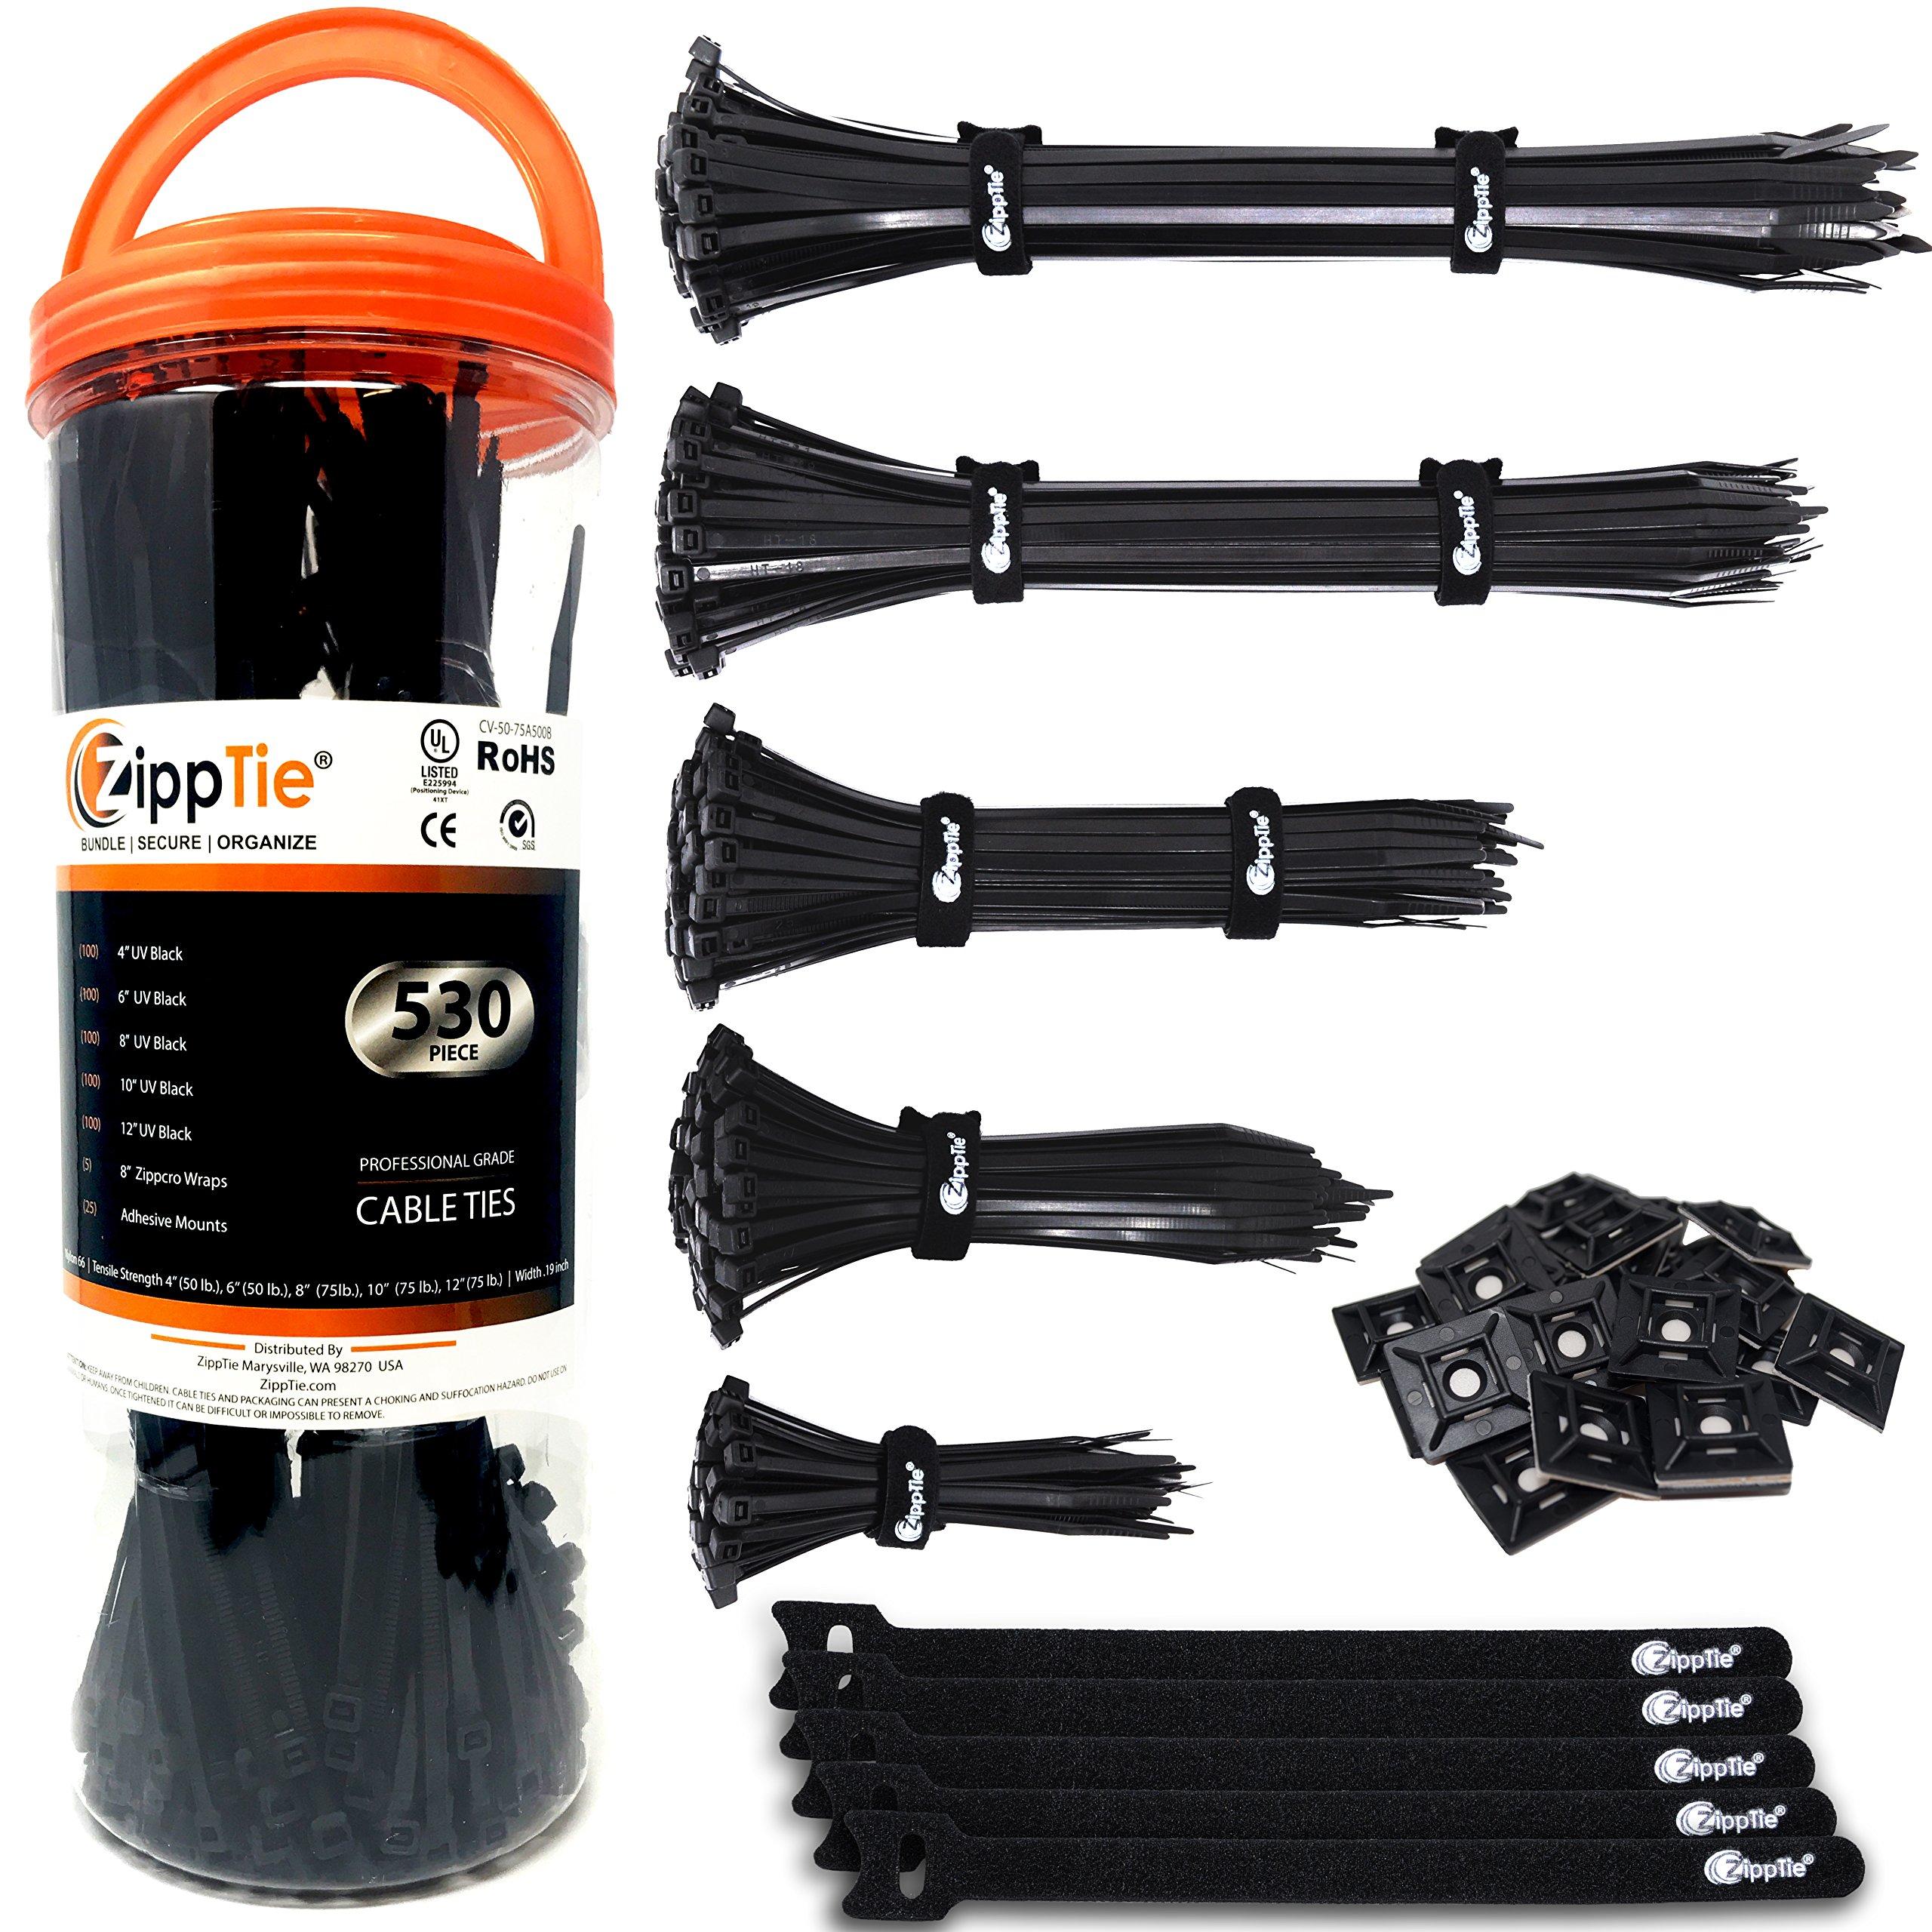 Cable Ties by ZippTie | 530pc Cable Management Kit 4'' 6'' 8'' 10'' 12'' UV Black Heavy Duty 50lb & 75lb (Zip Ties) Includes 25 Adhesive Base Mounts & 5 Reusable ZippCro Tie Wraps